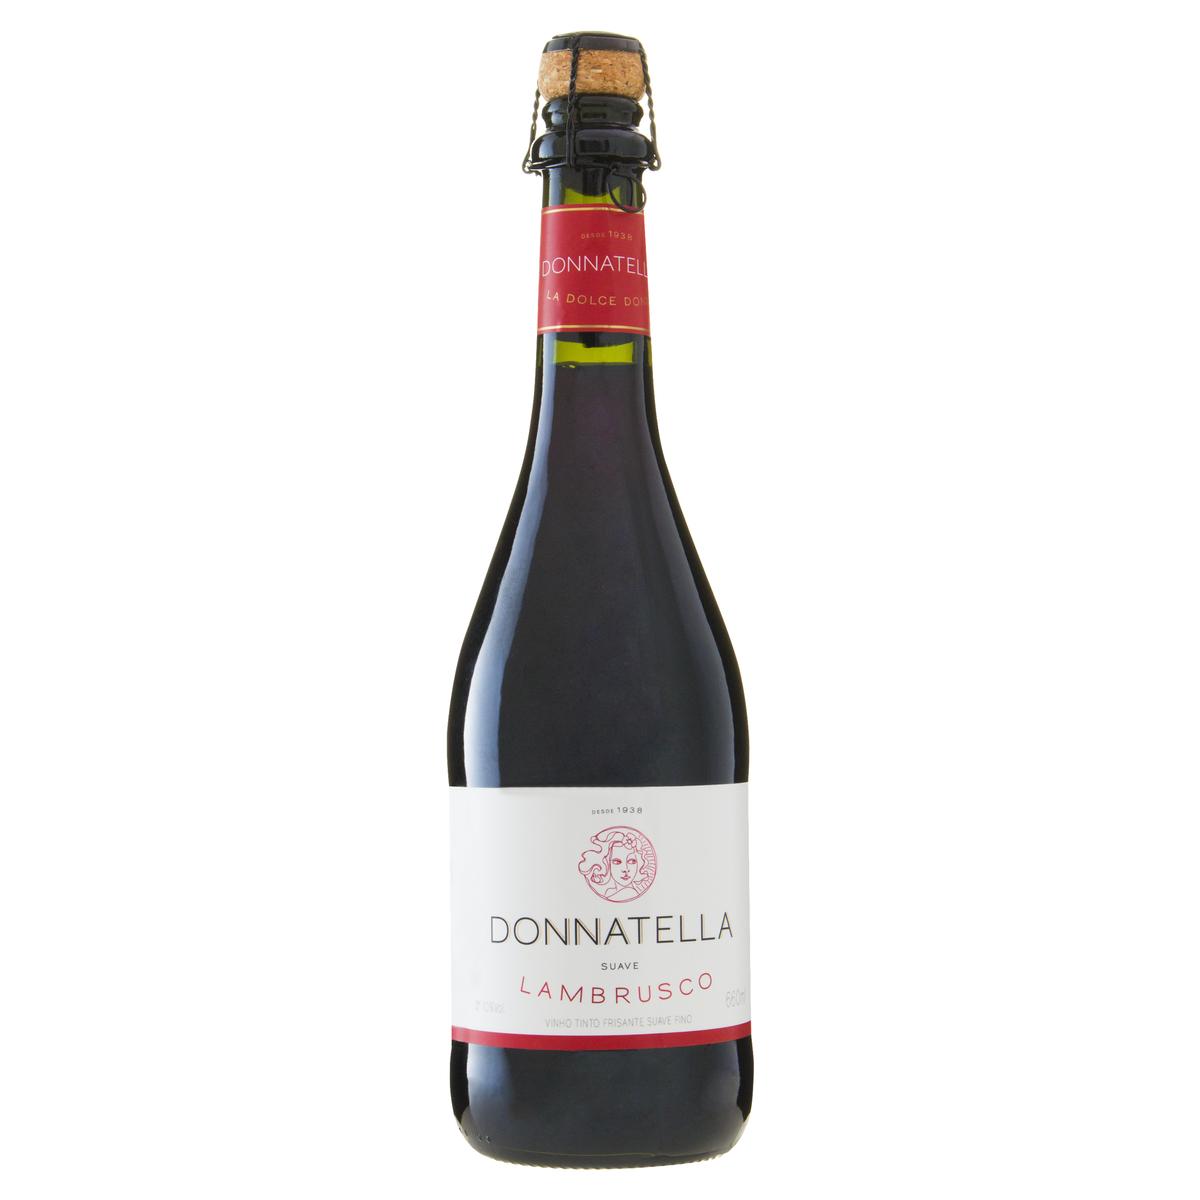 Vinho Brasileiro Tinto Frisante Fino Suave Donnatella Lambrusco Garrafa 660ml